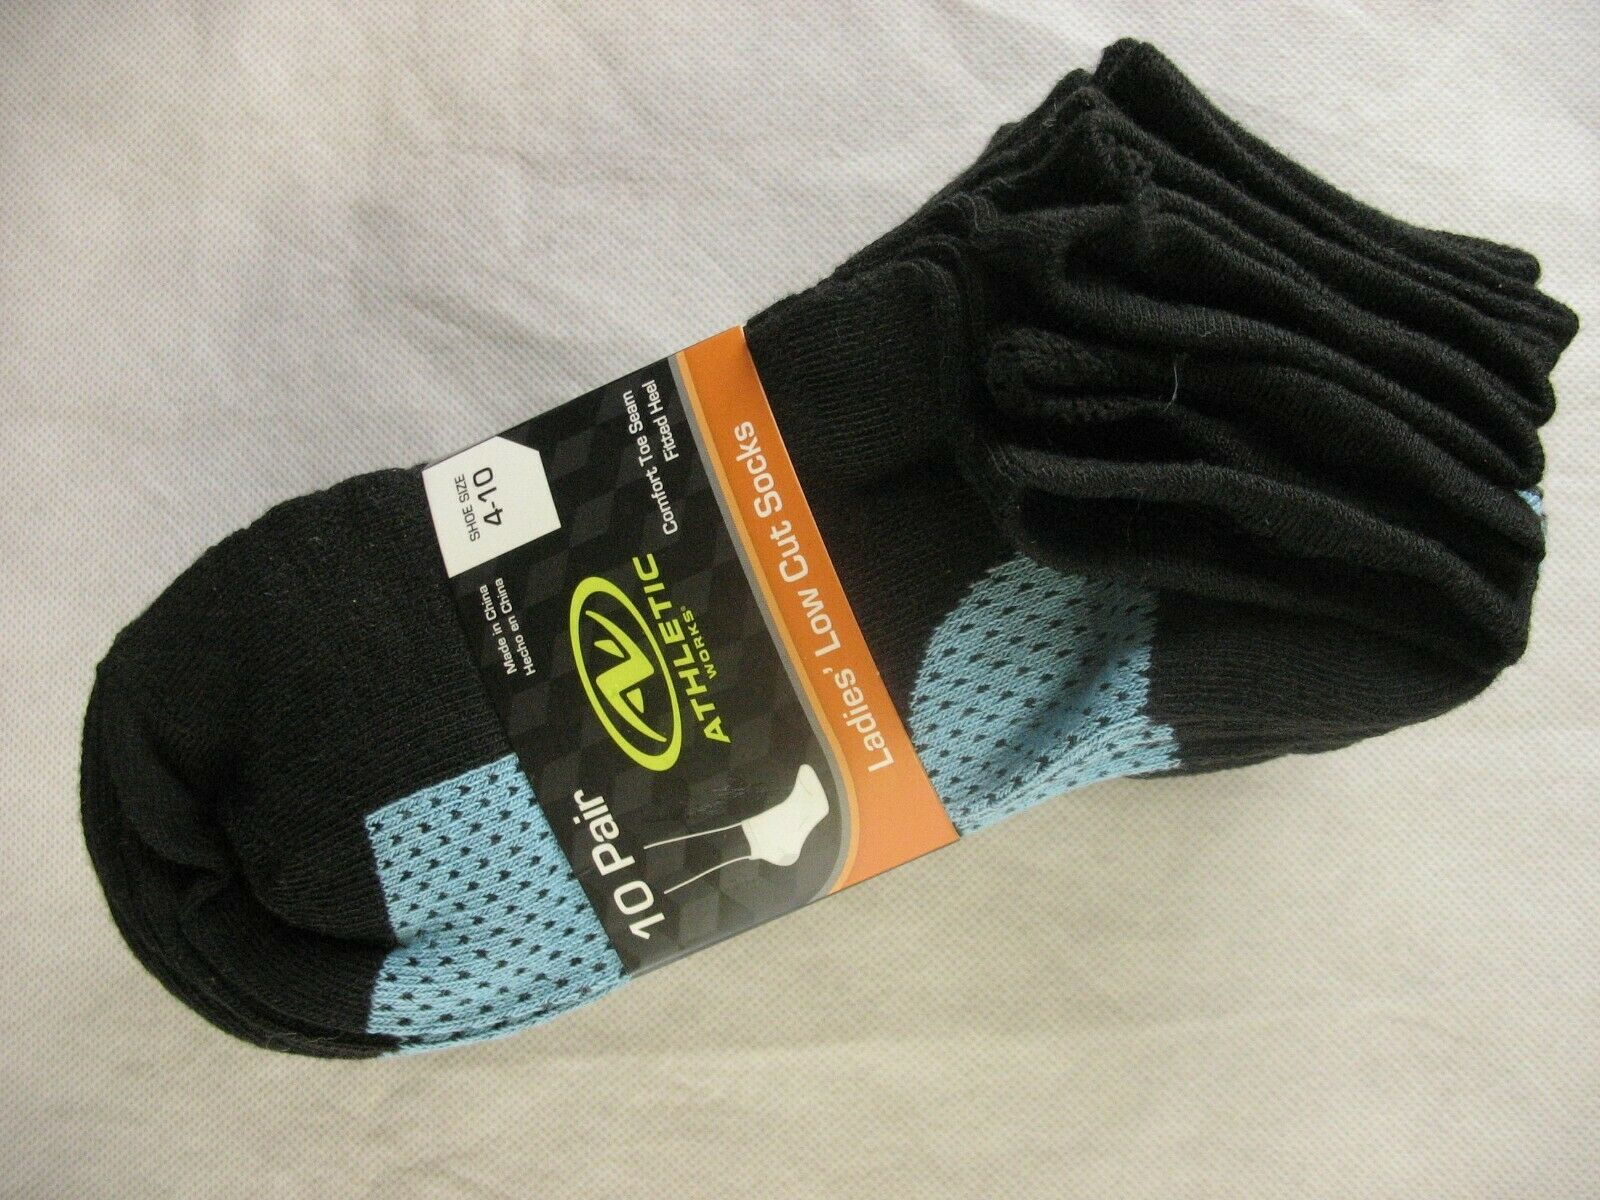 Athletic Works Women's Light No Show Socks 10 Pairs Shoe Sizes 4-10 polka dot